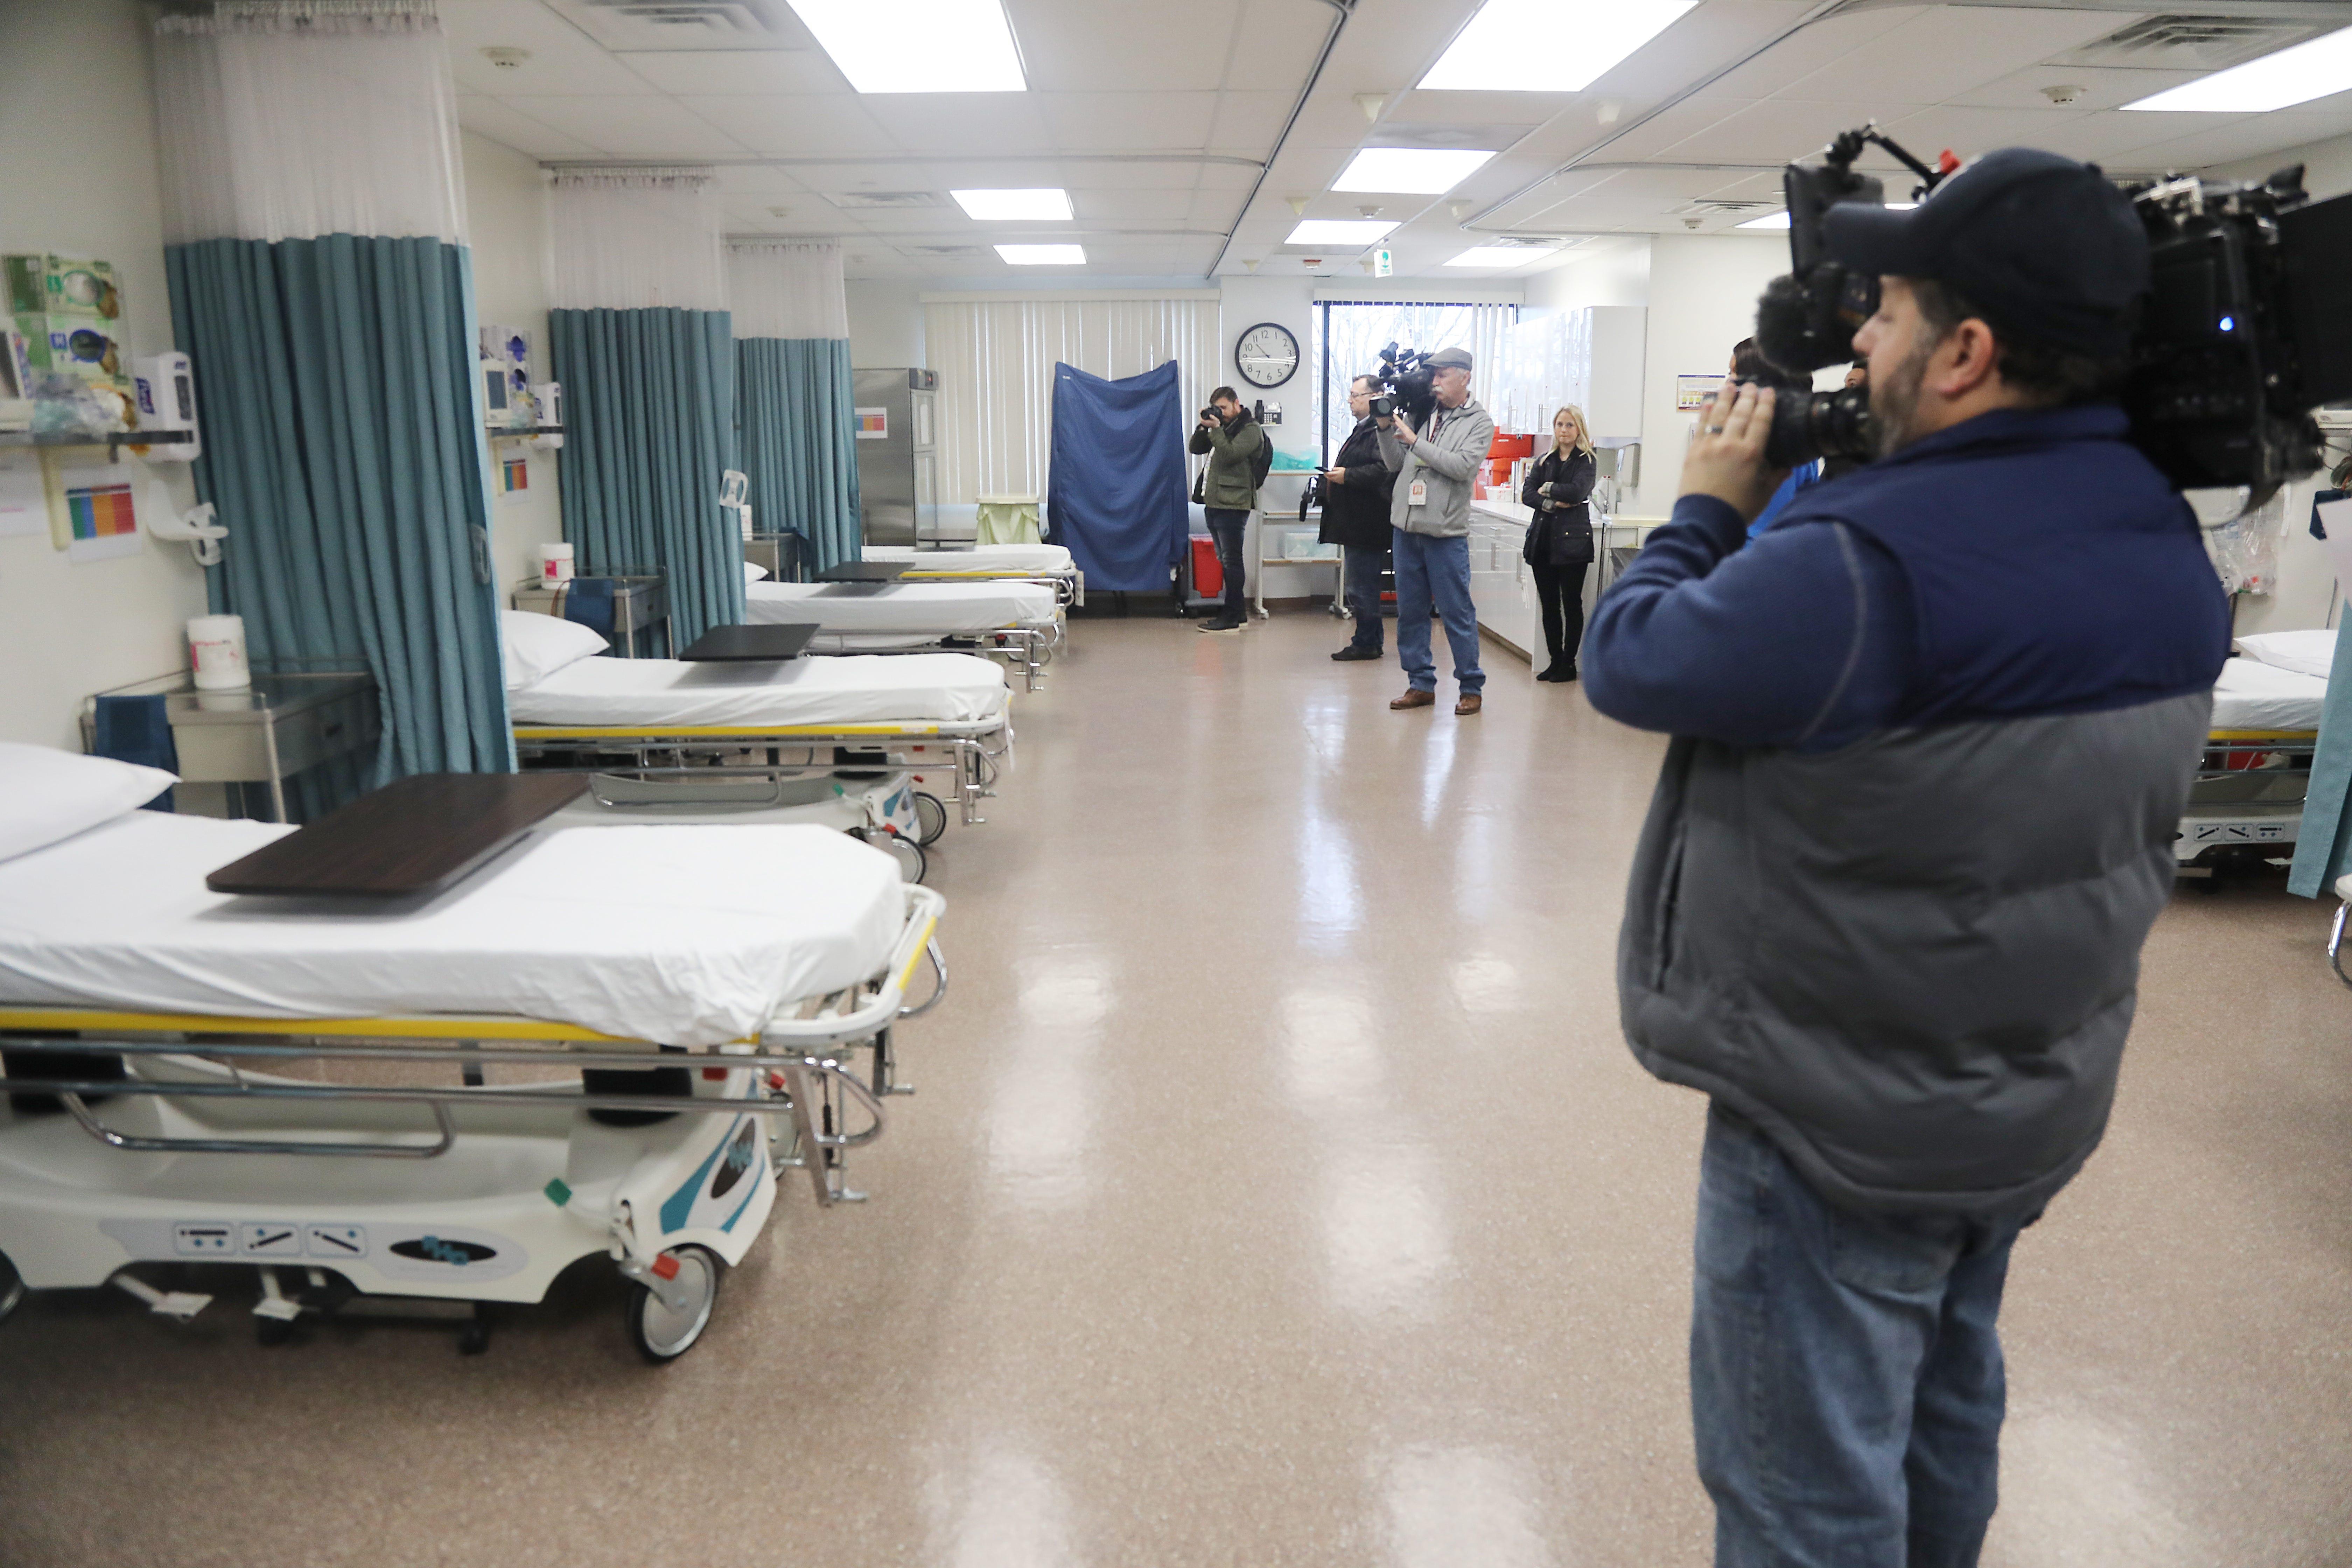 Lawsuit: Hackensack NJ surgery center billed $28M in